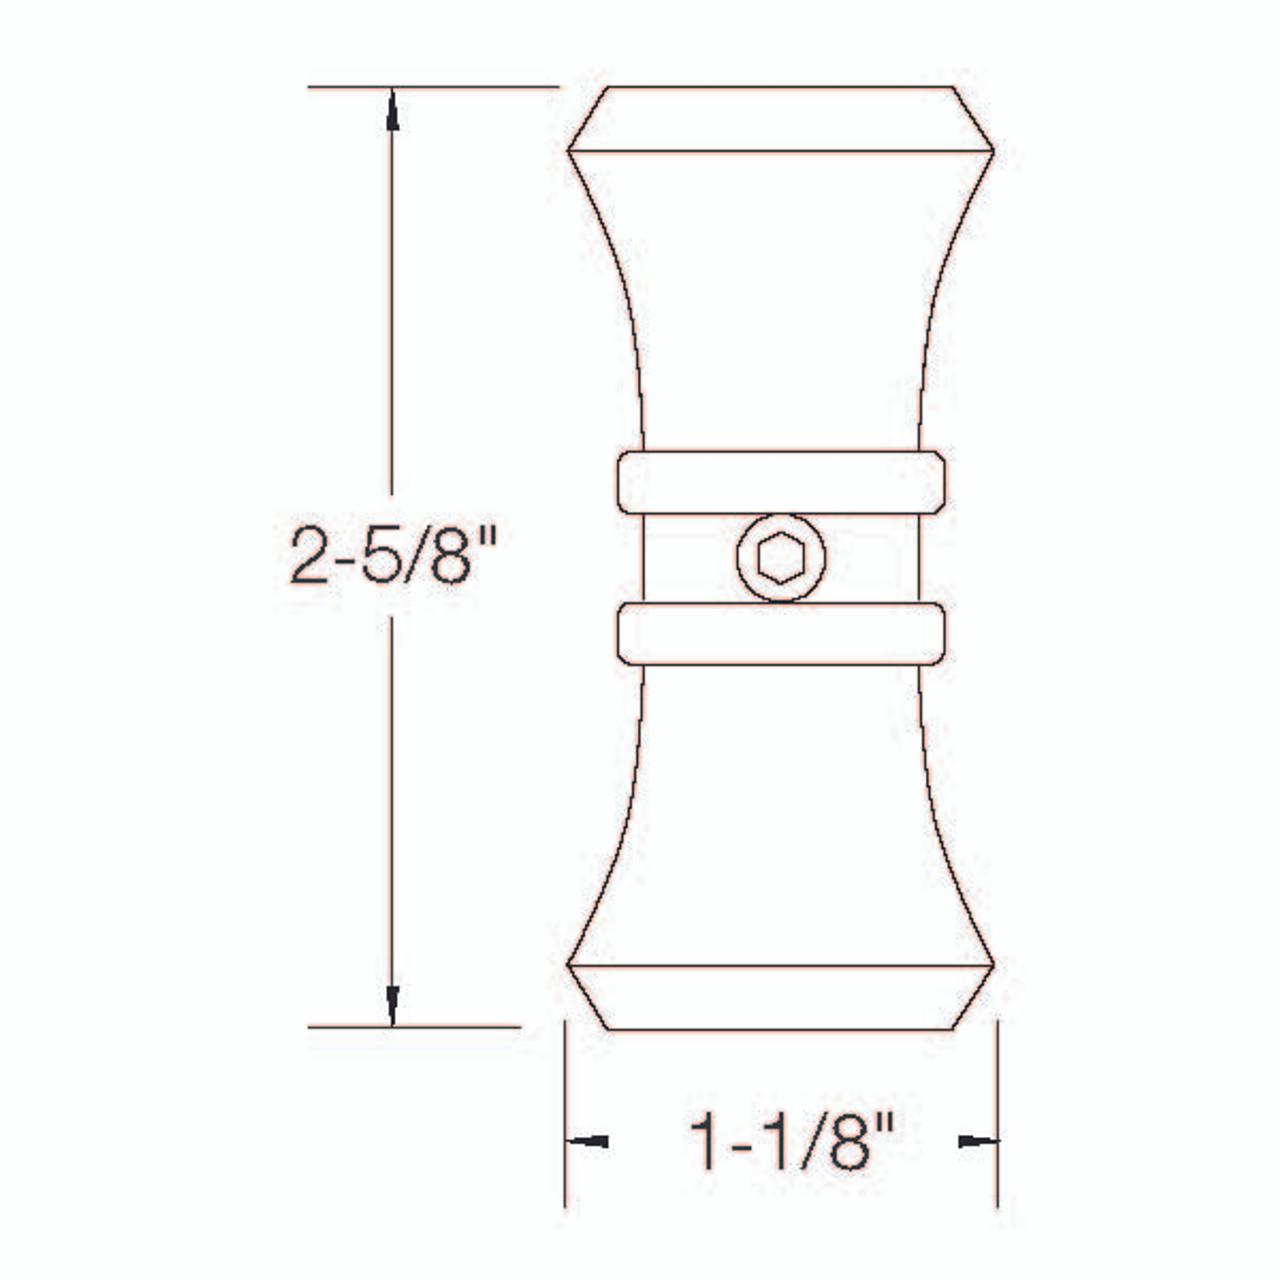 C2 Large Collar Dimensional Information